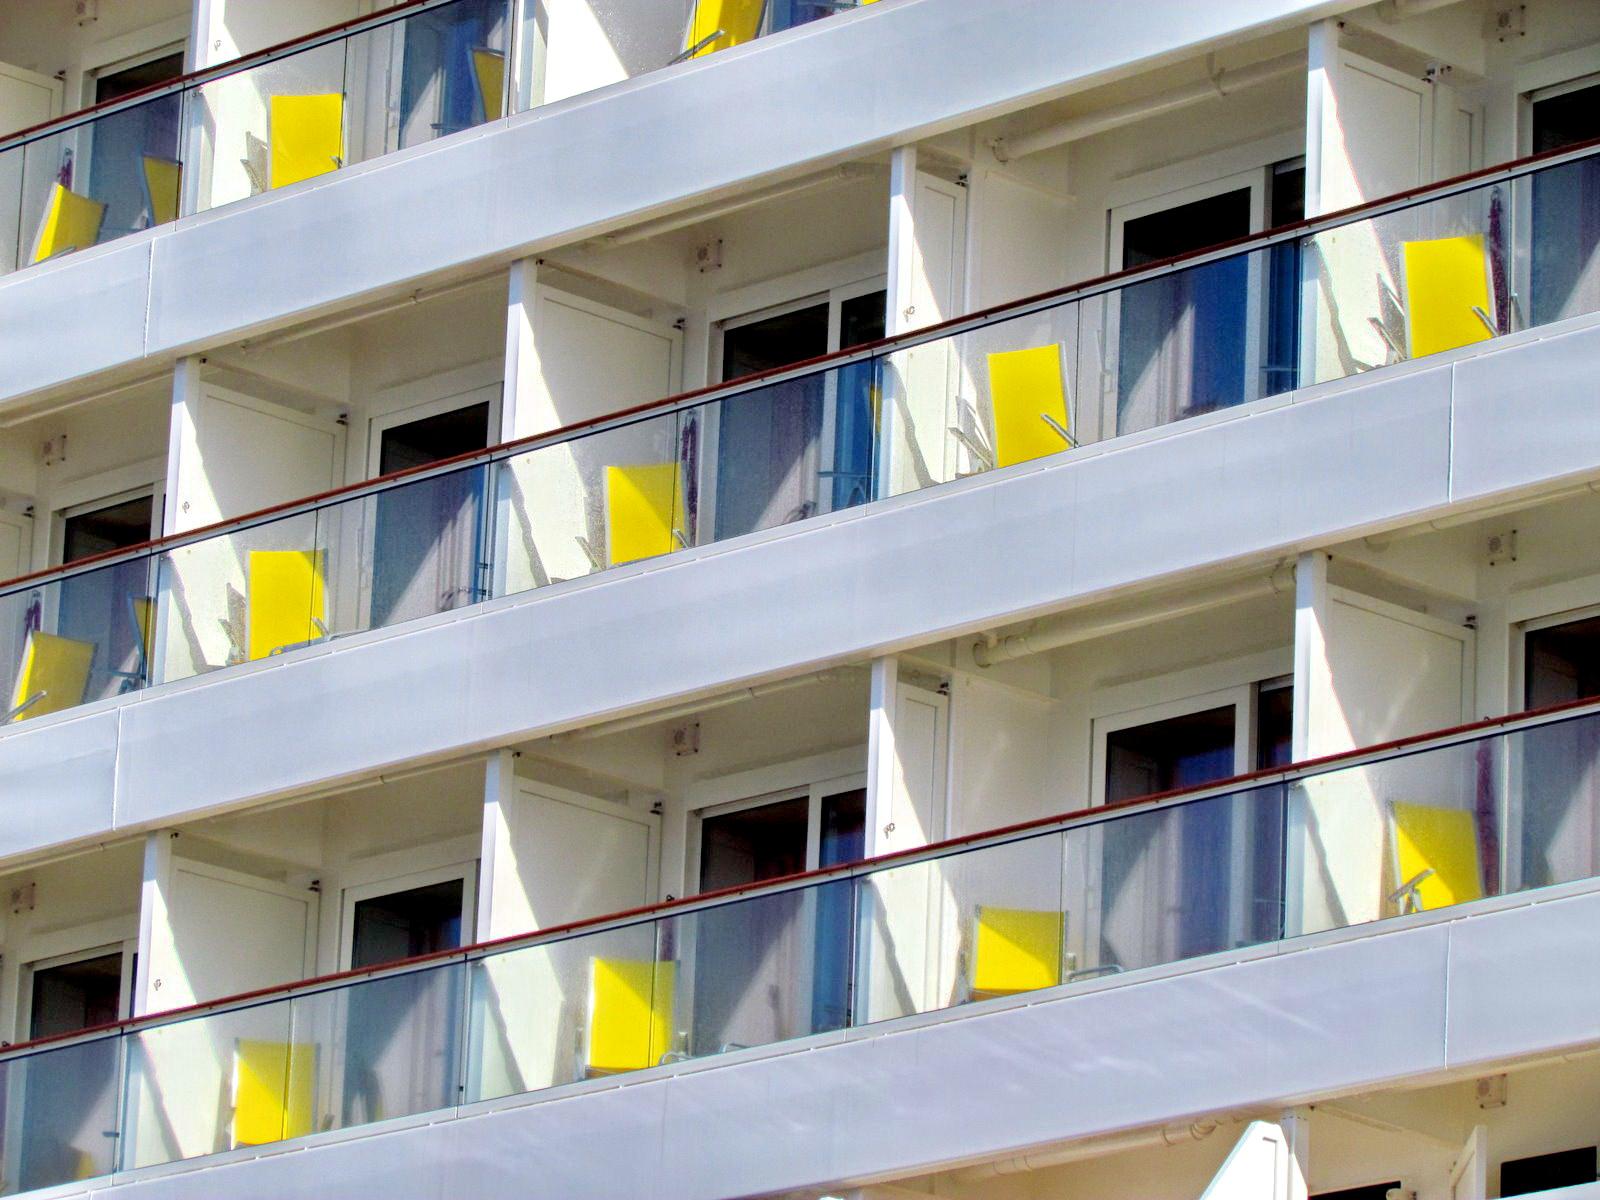 balconies in AIDASol